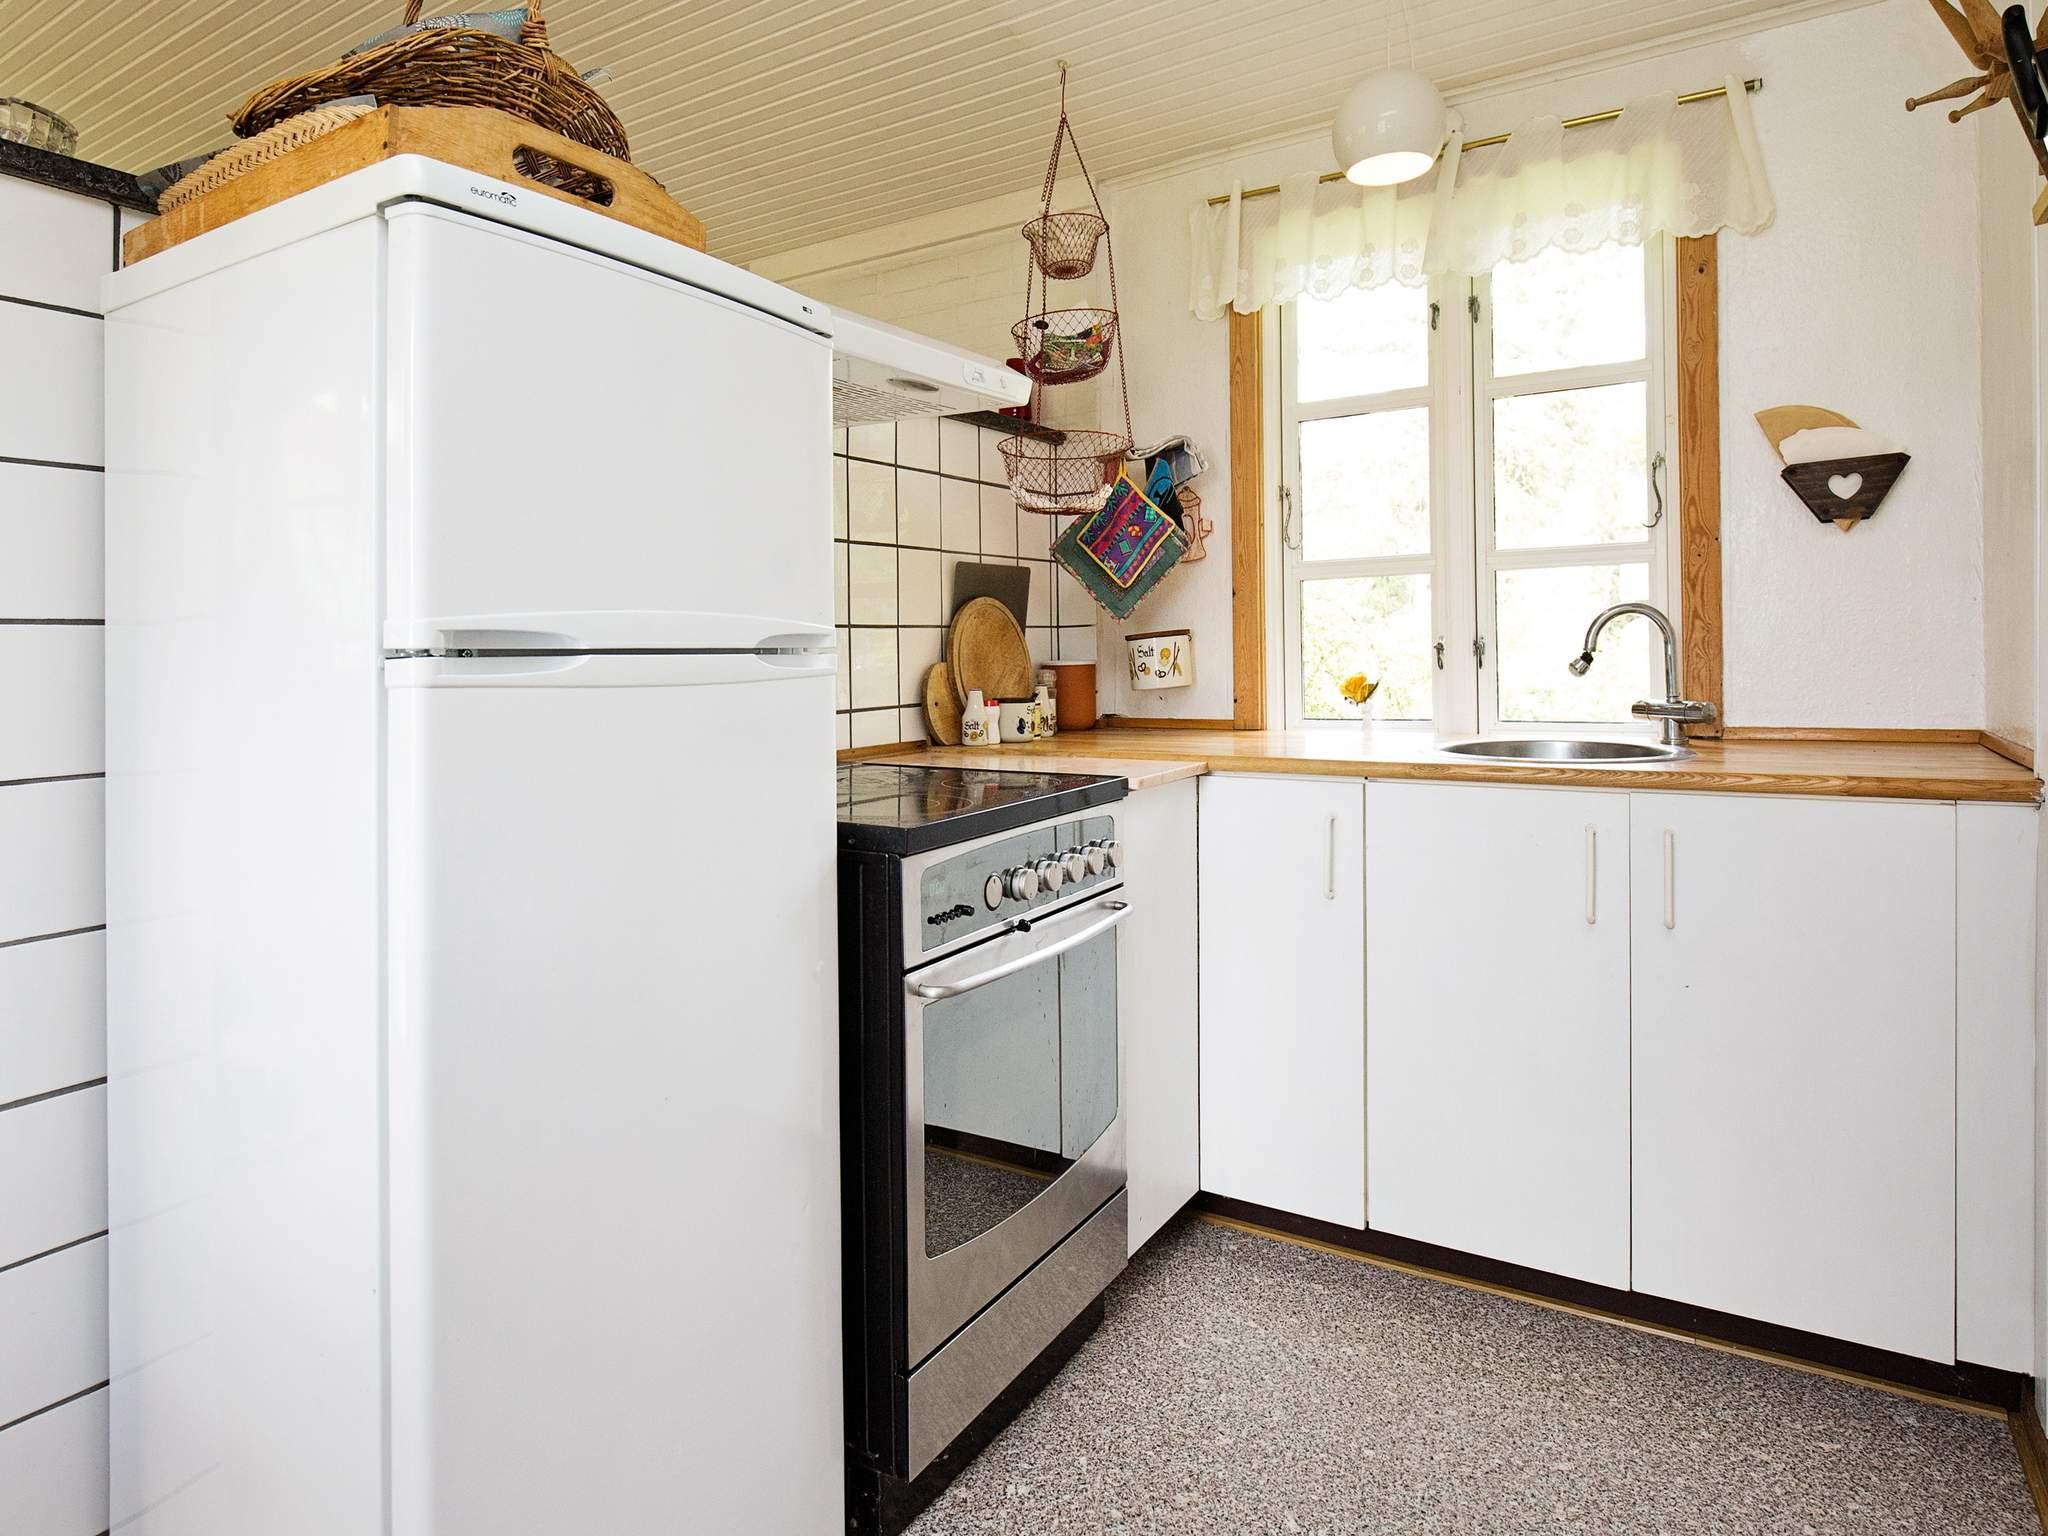 Ferienhaus Yderby Lyng (89303), Yderby, , Westseeland, Dänemark, Bild 2